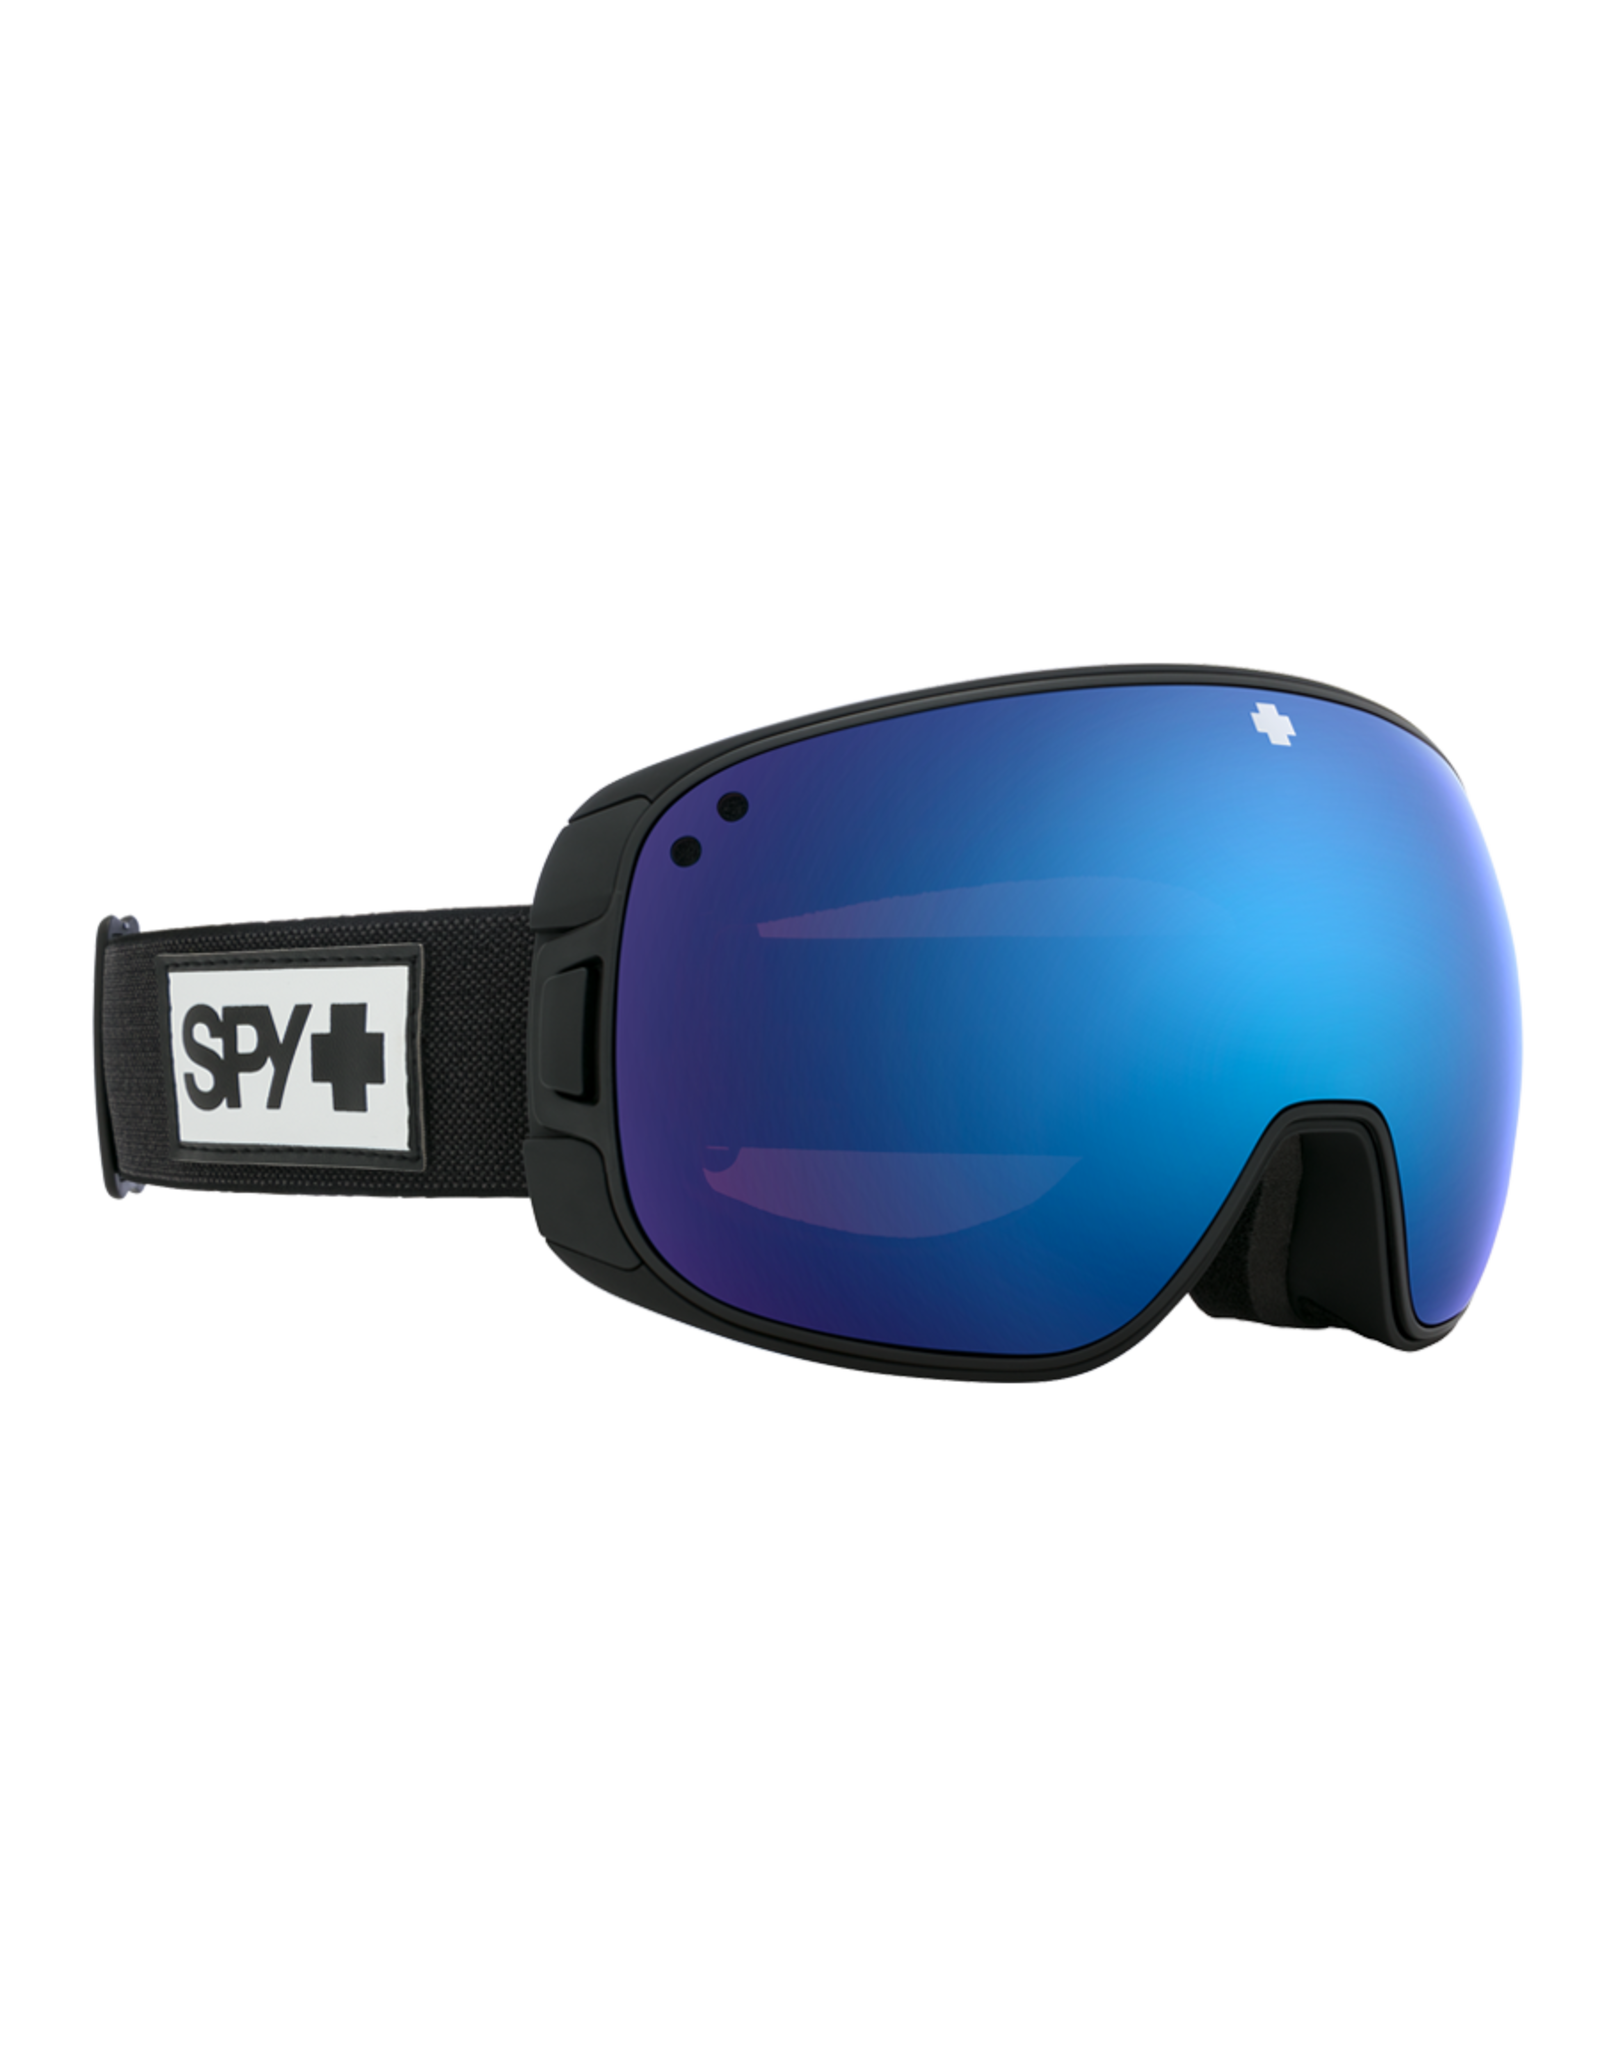 SPY Bravo Matte Black w/HD Plus Rose/Dark Blue Spectra Mirror and HD Plus LL Yellow/Green Spectra Mirror